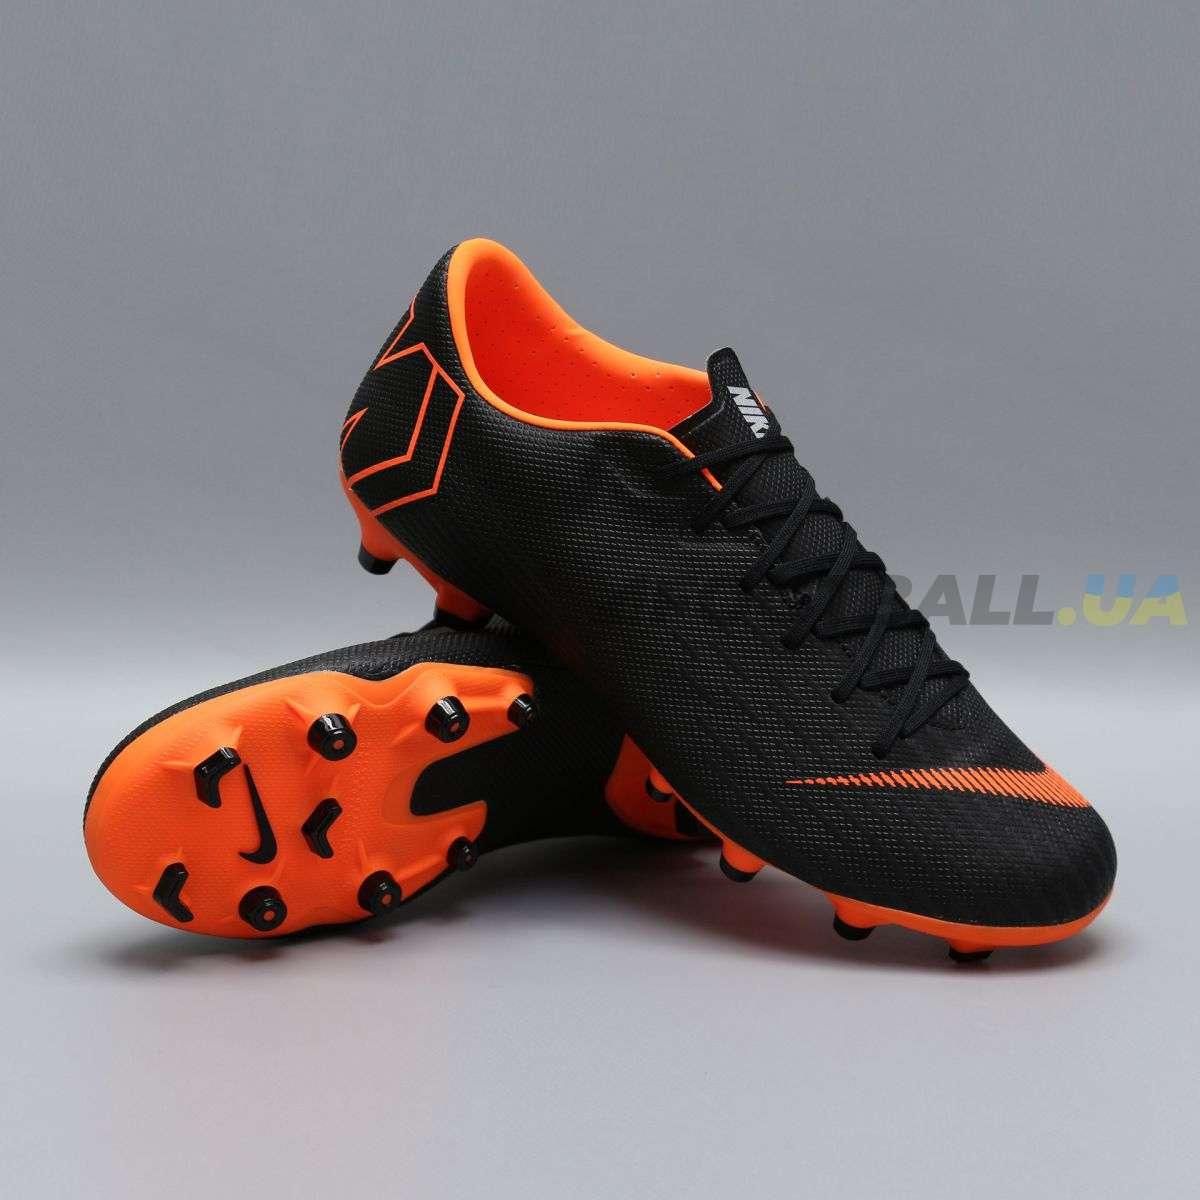 41bfce7f Бутсы Nike Mercurial Vapor Academy AH7375-081 купить на 4football ...